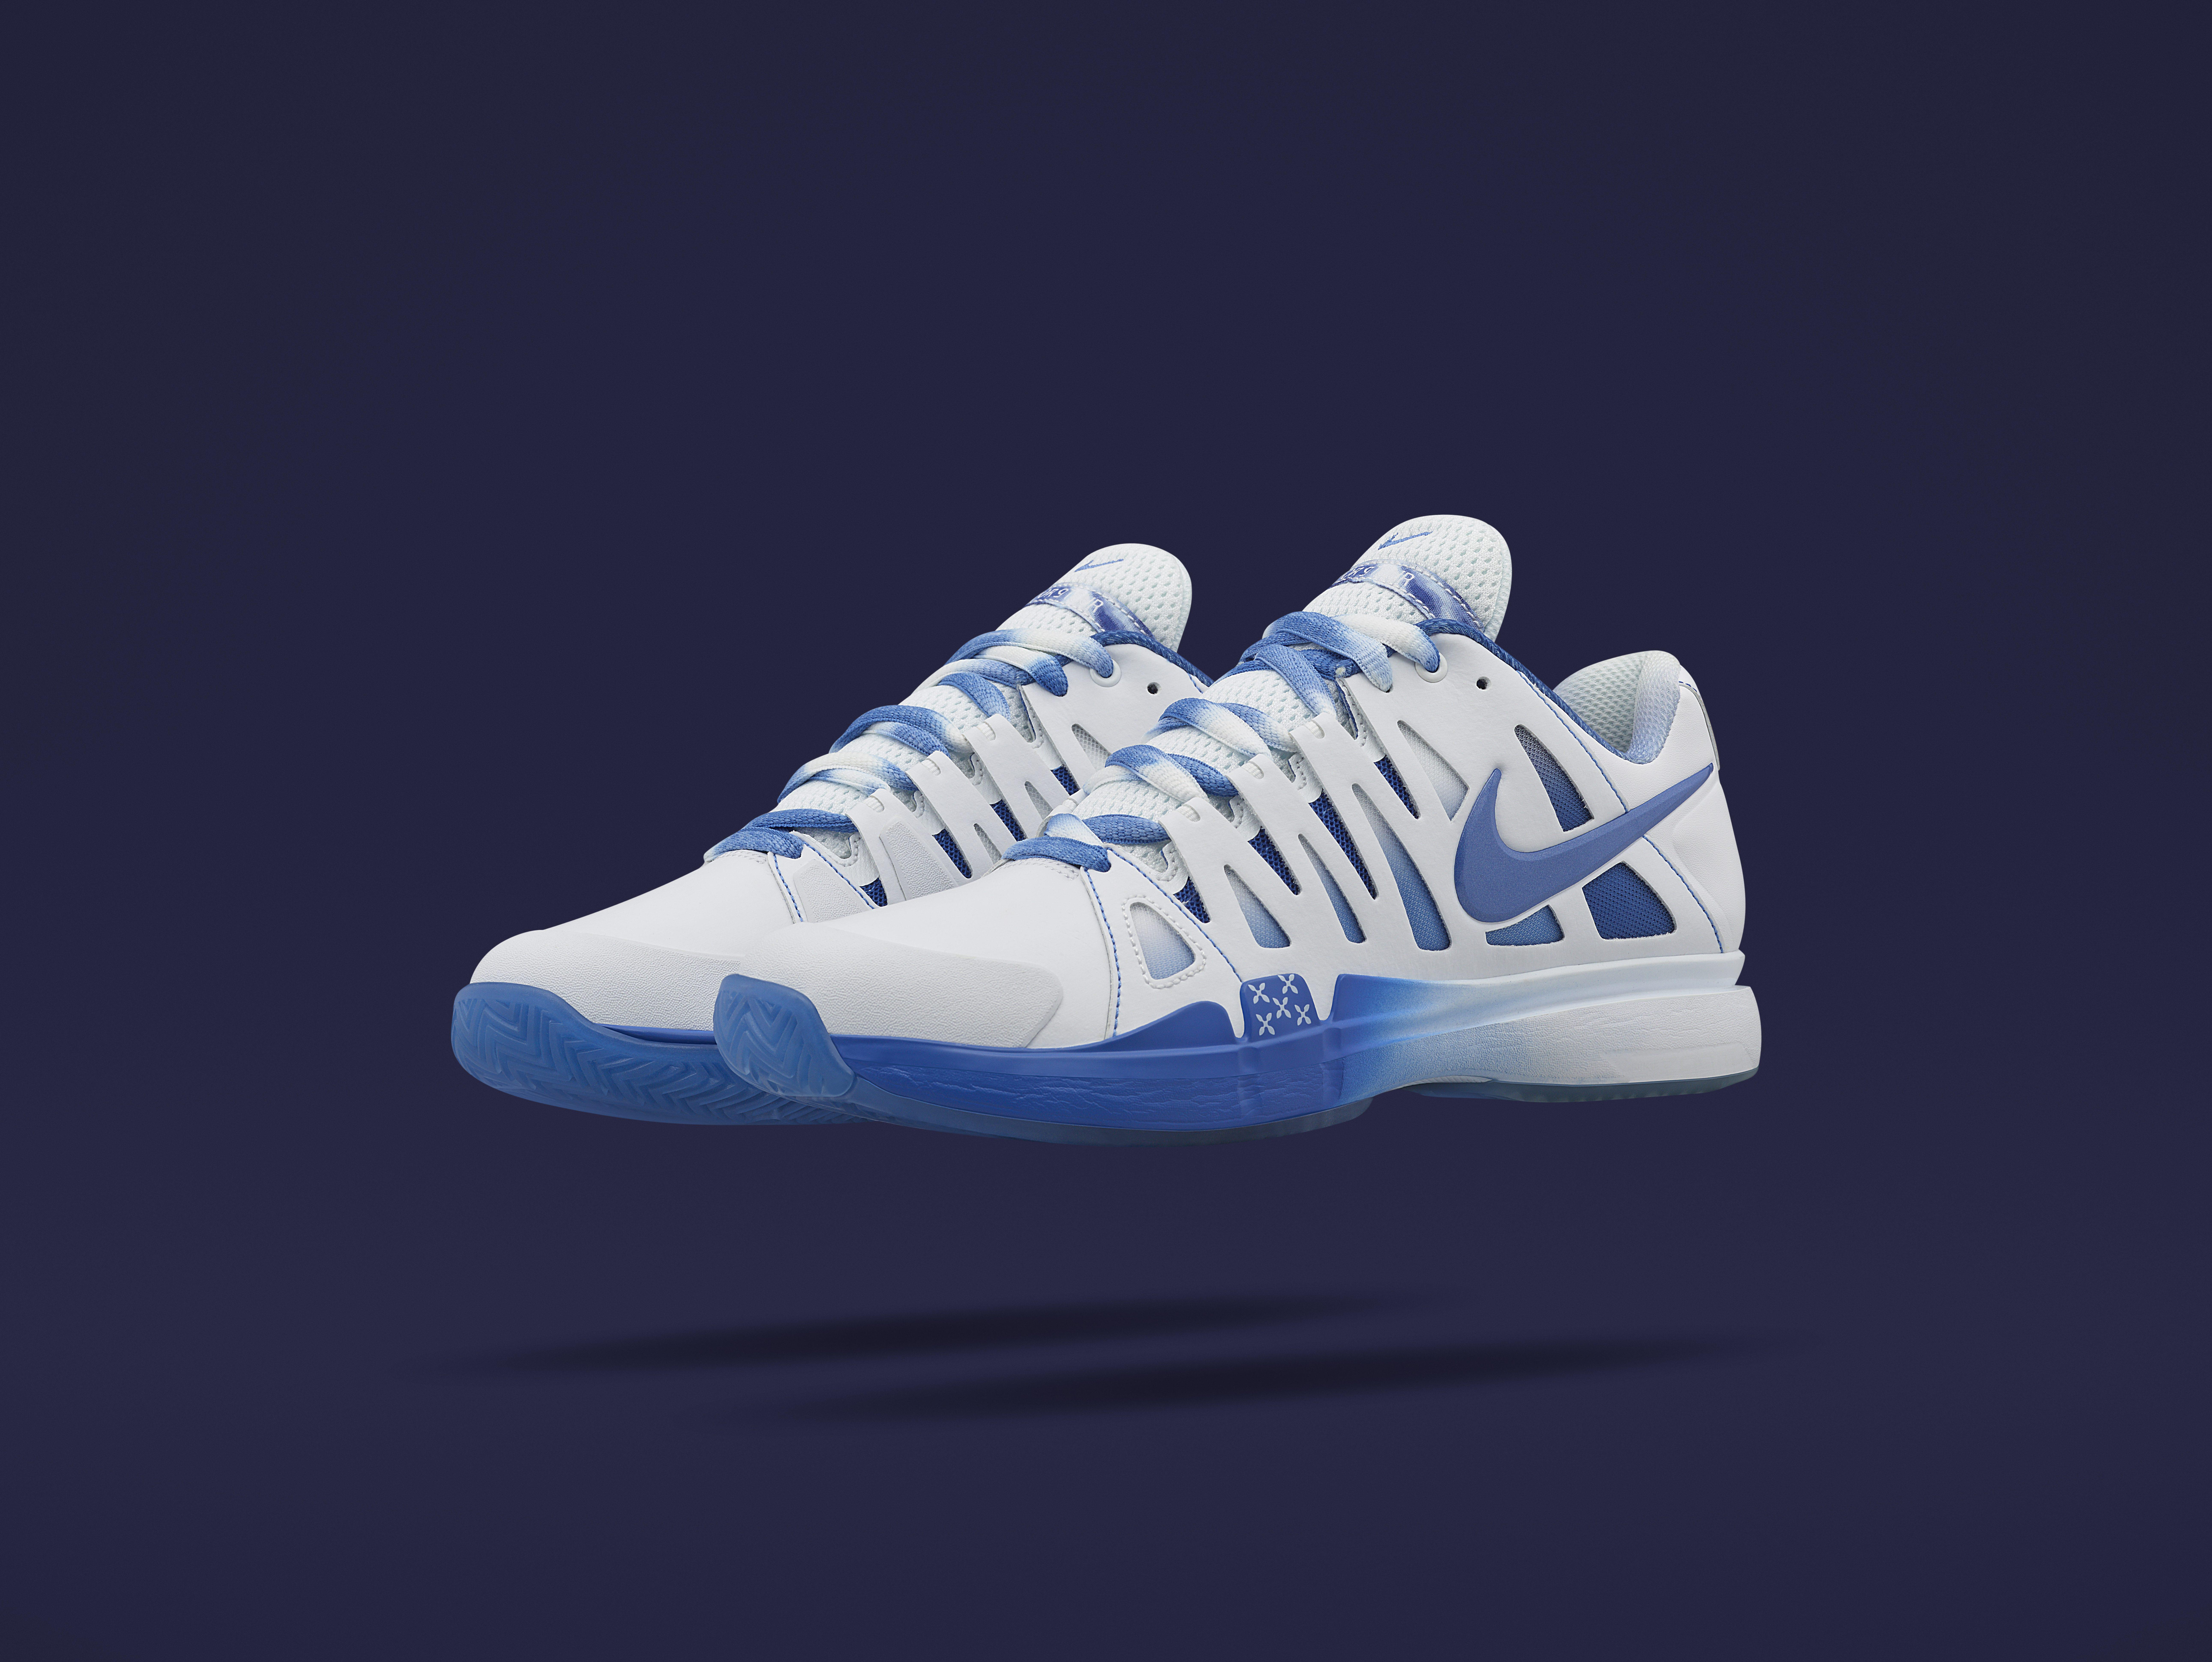 NikeCourt x Colette Kollektion 2015 8